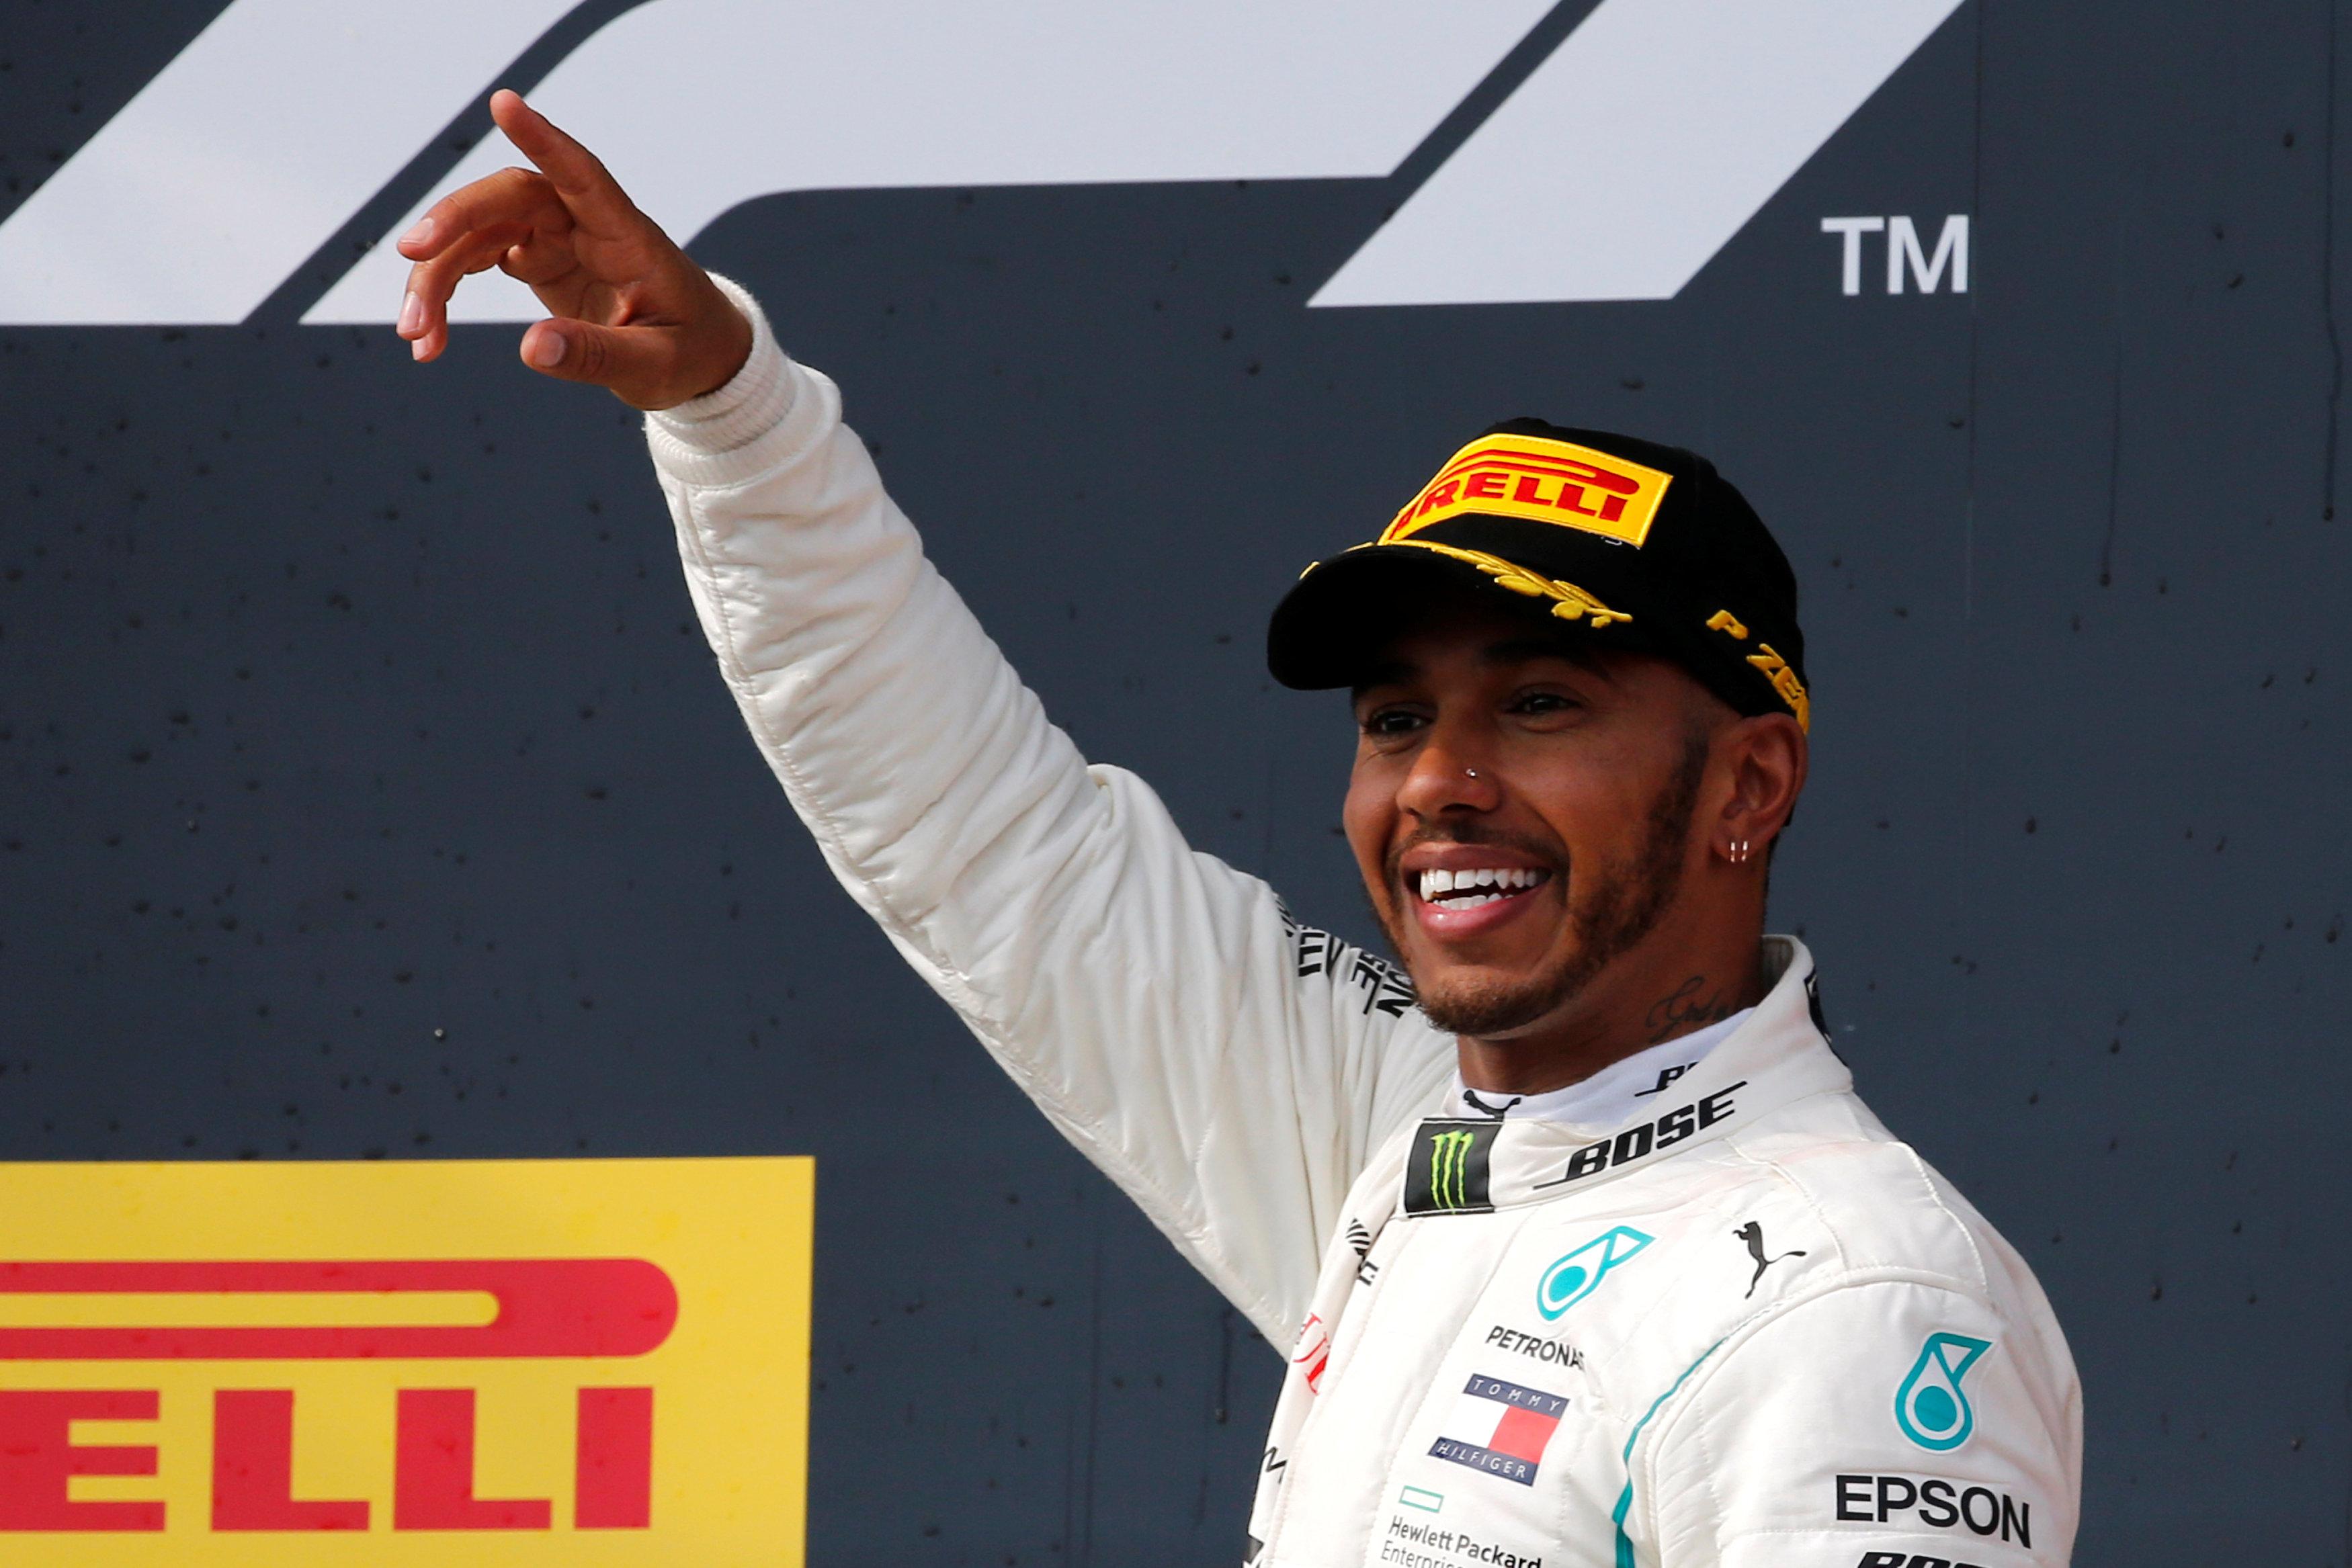 Motorsport: Hamilton hopes to pull away in Austria